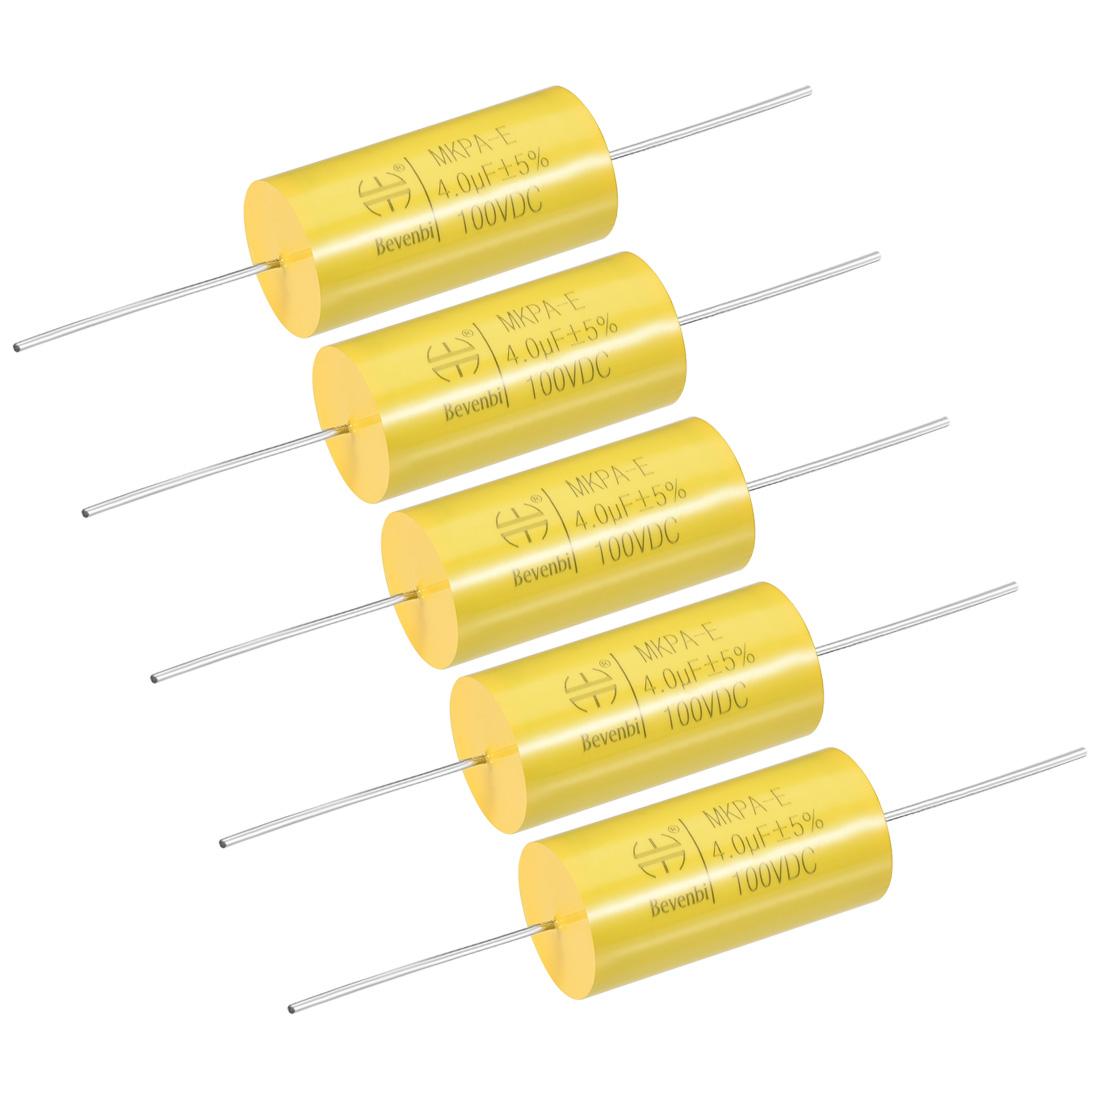 Film Capacitor 100V DC 4.0uF MKPA-E Round Polypropylene Capacitors Yellow 5pcs